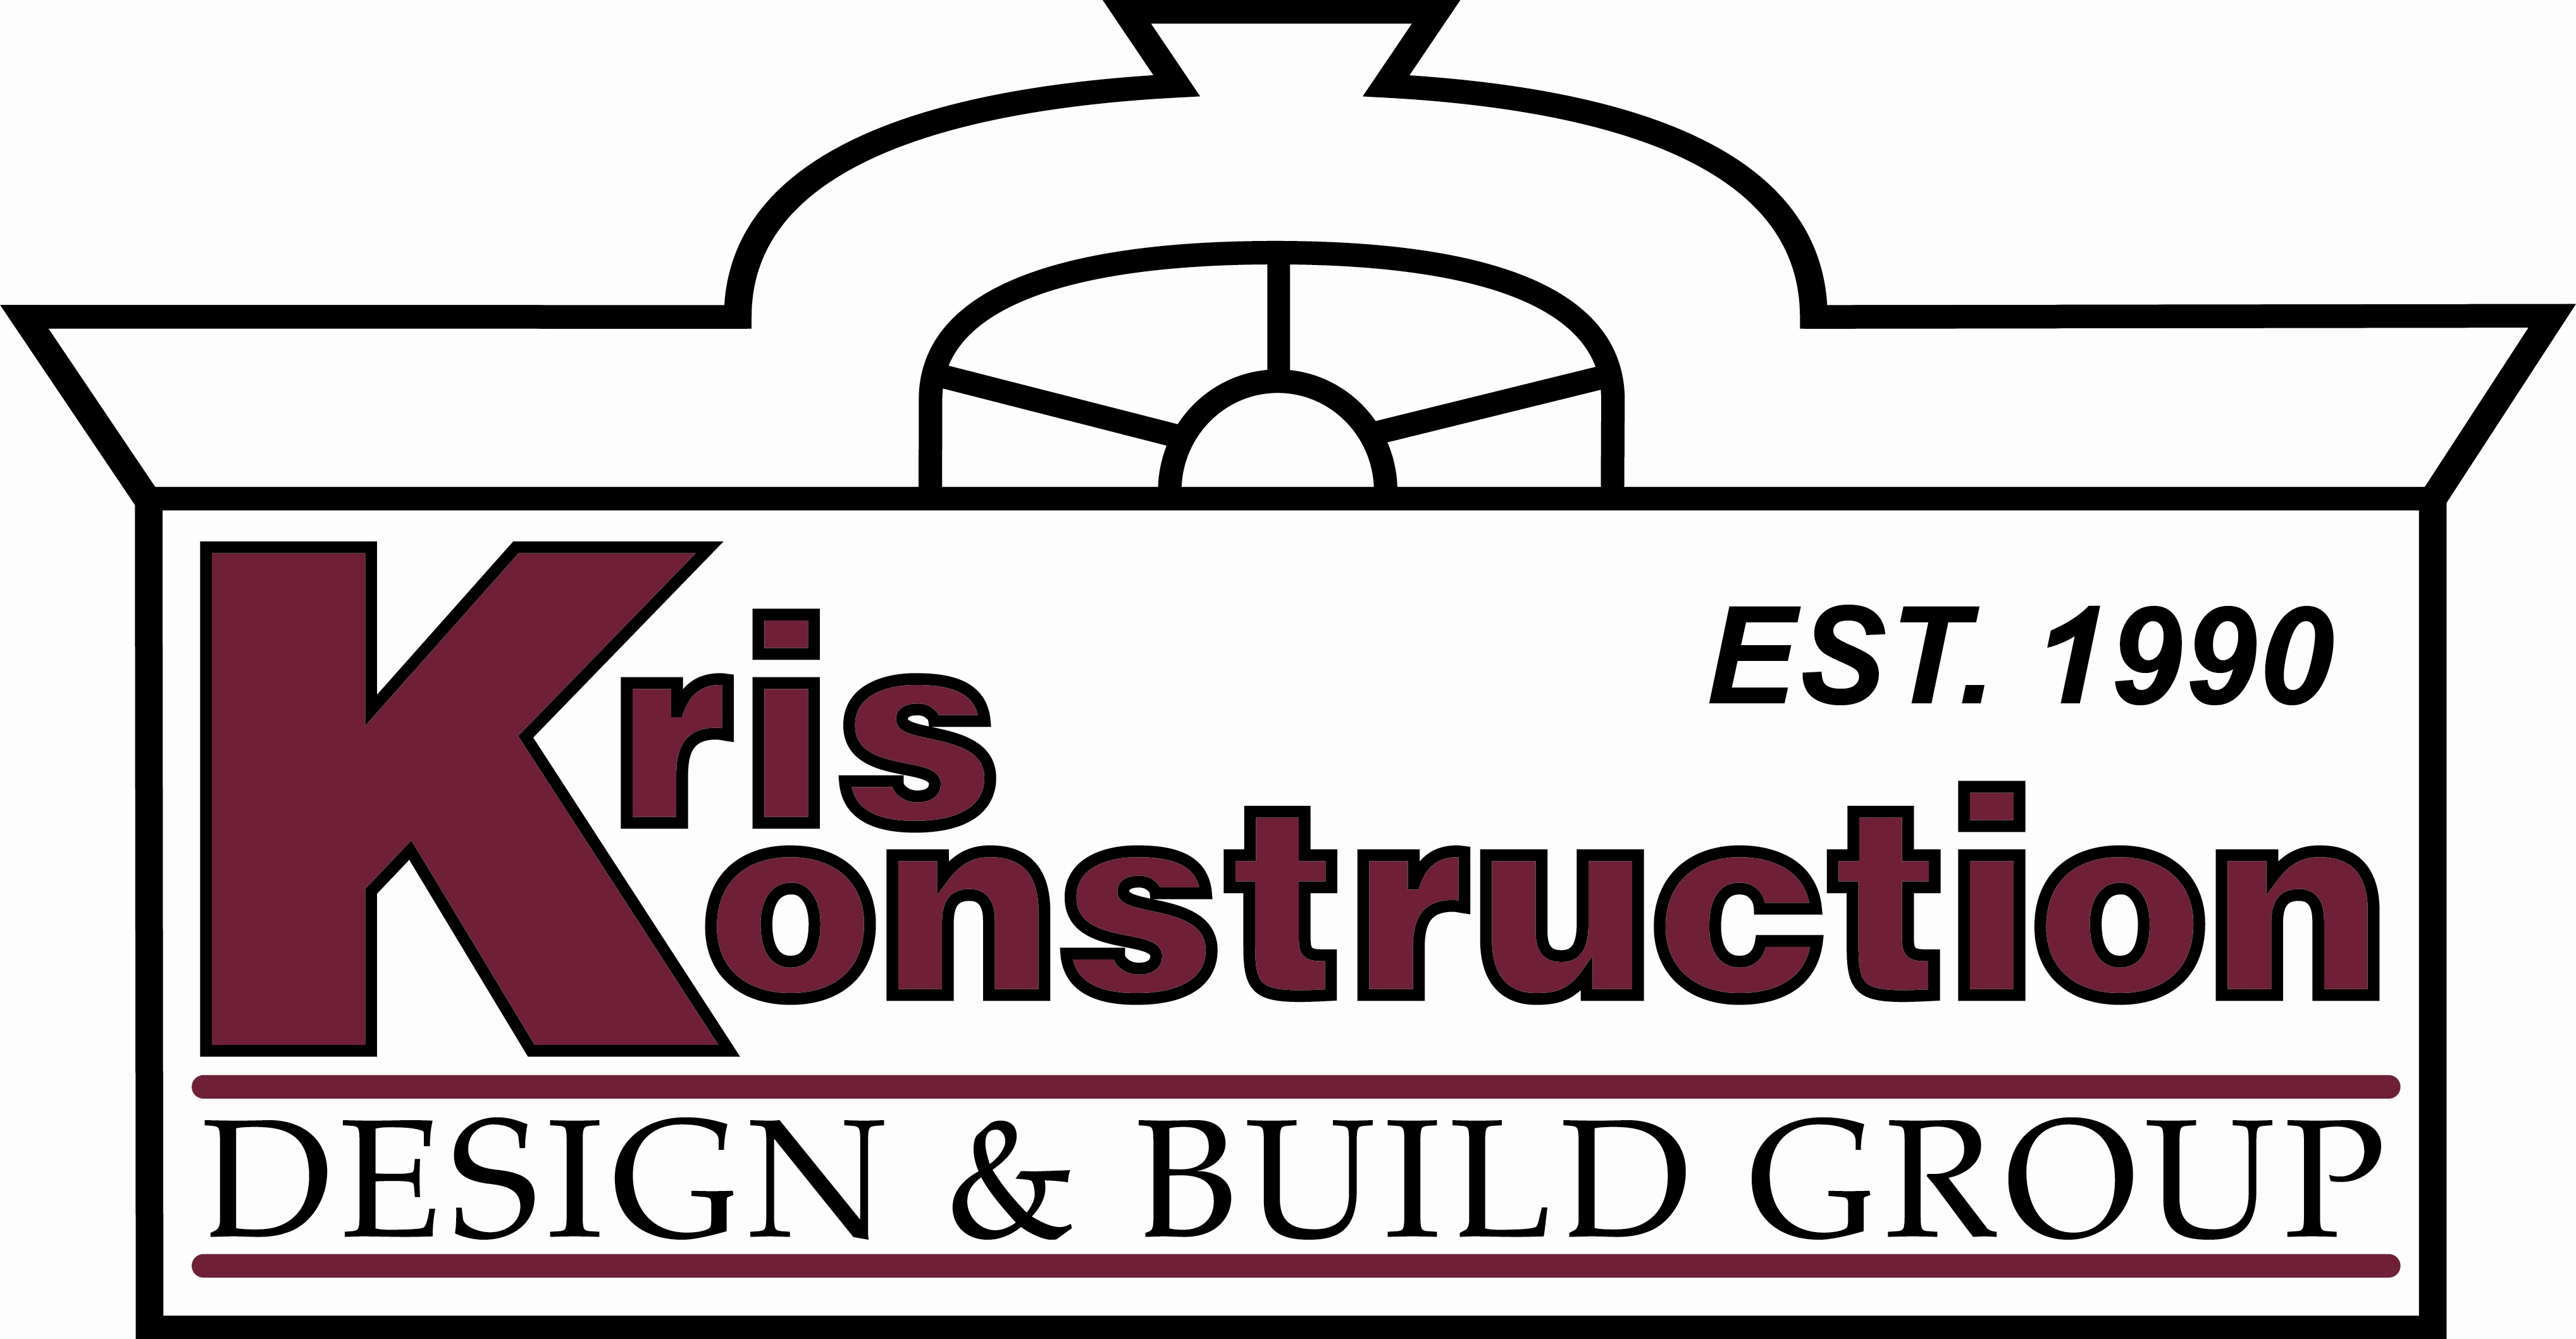 Kris Konstruction